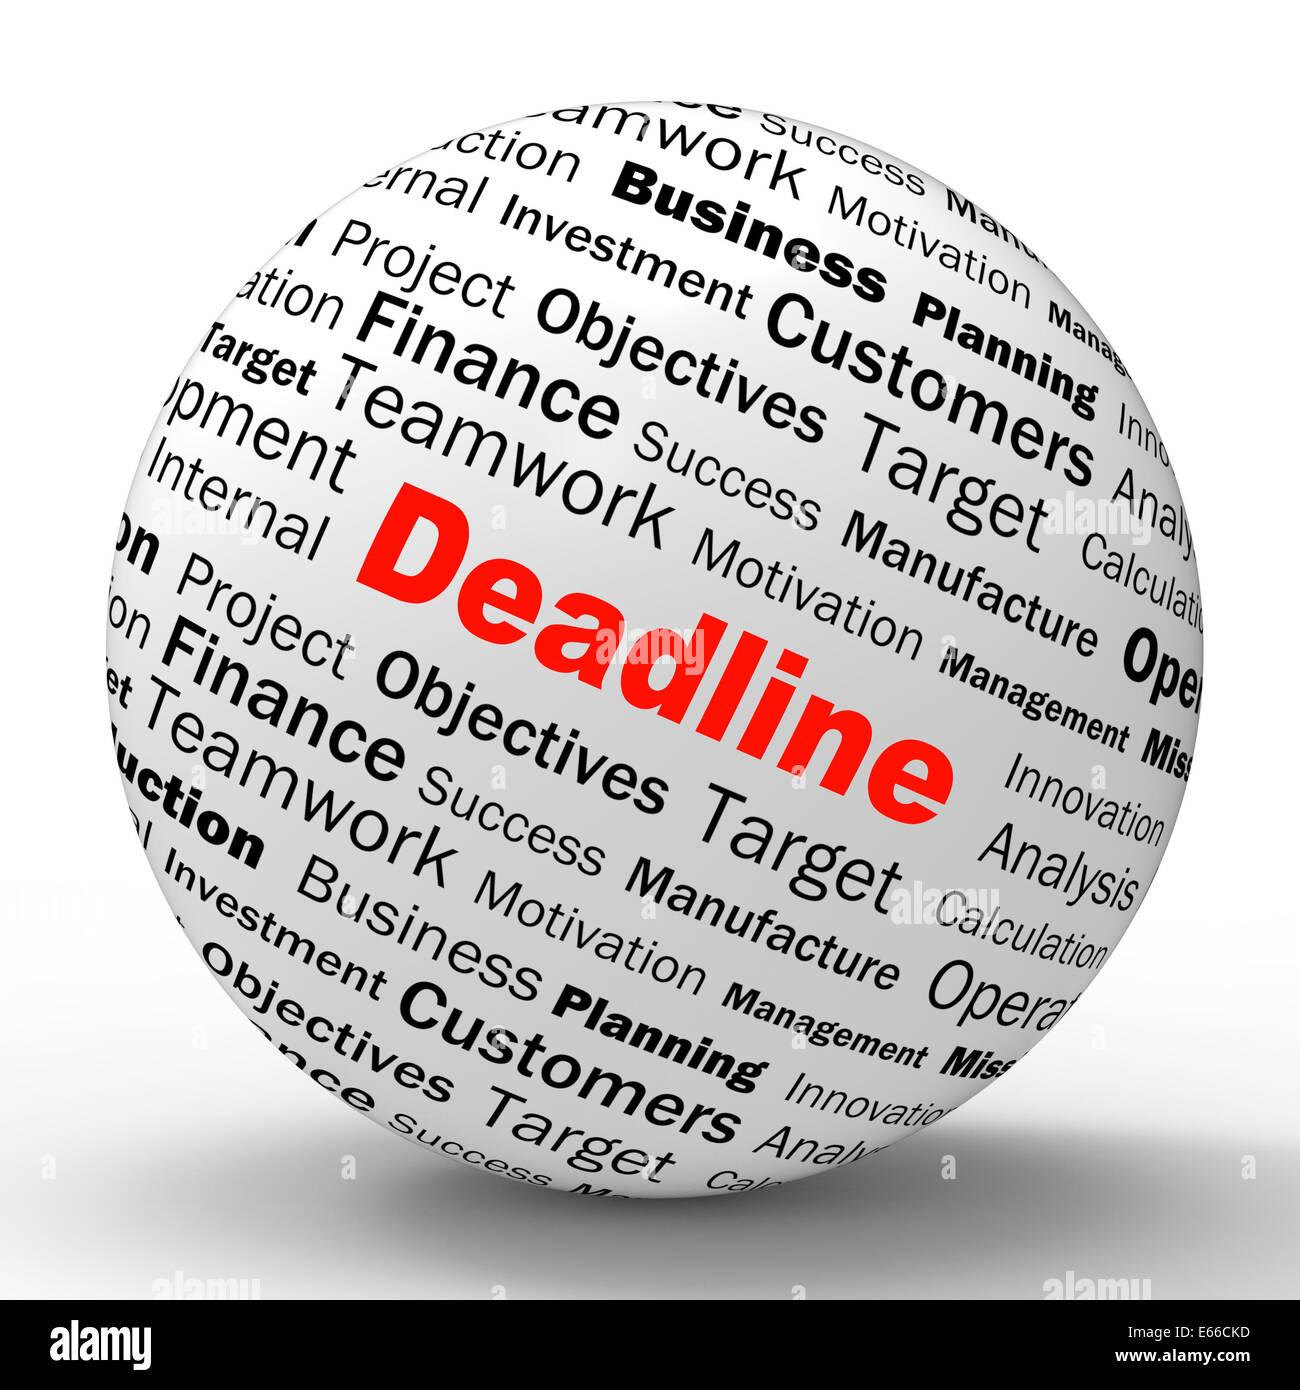 Deadline Limit Meaning Target Date Stockfotos & Deadline Limit ...